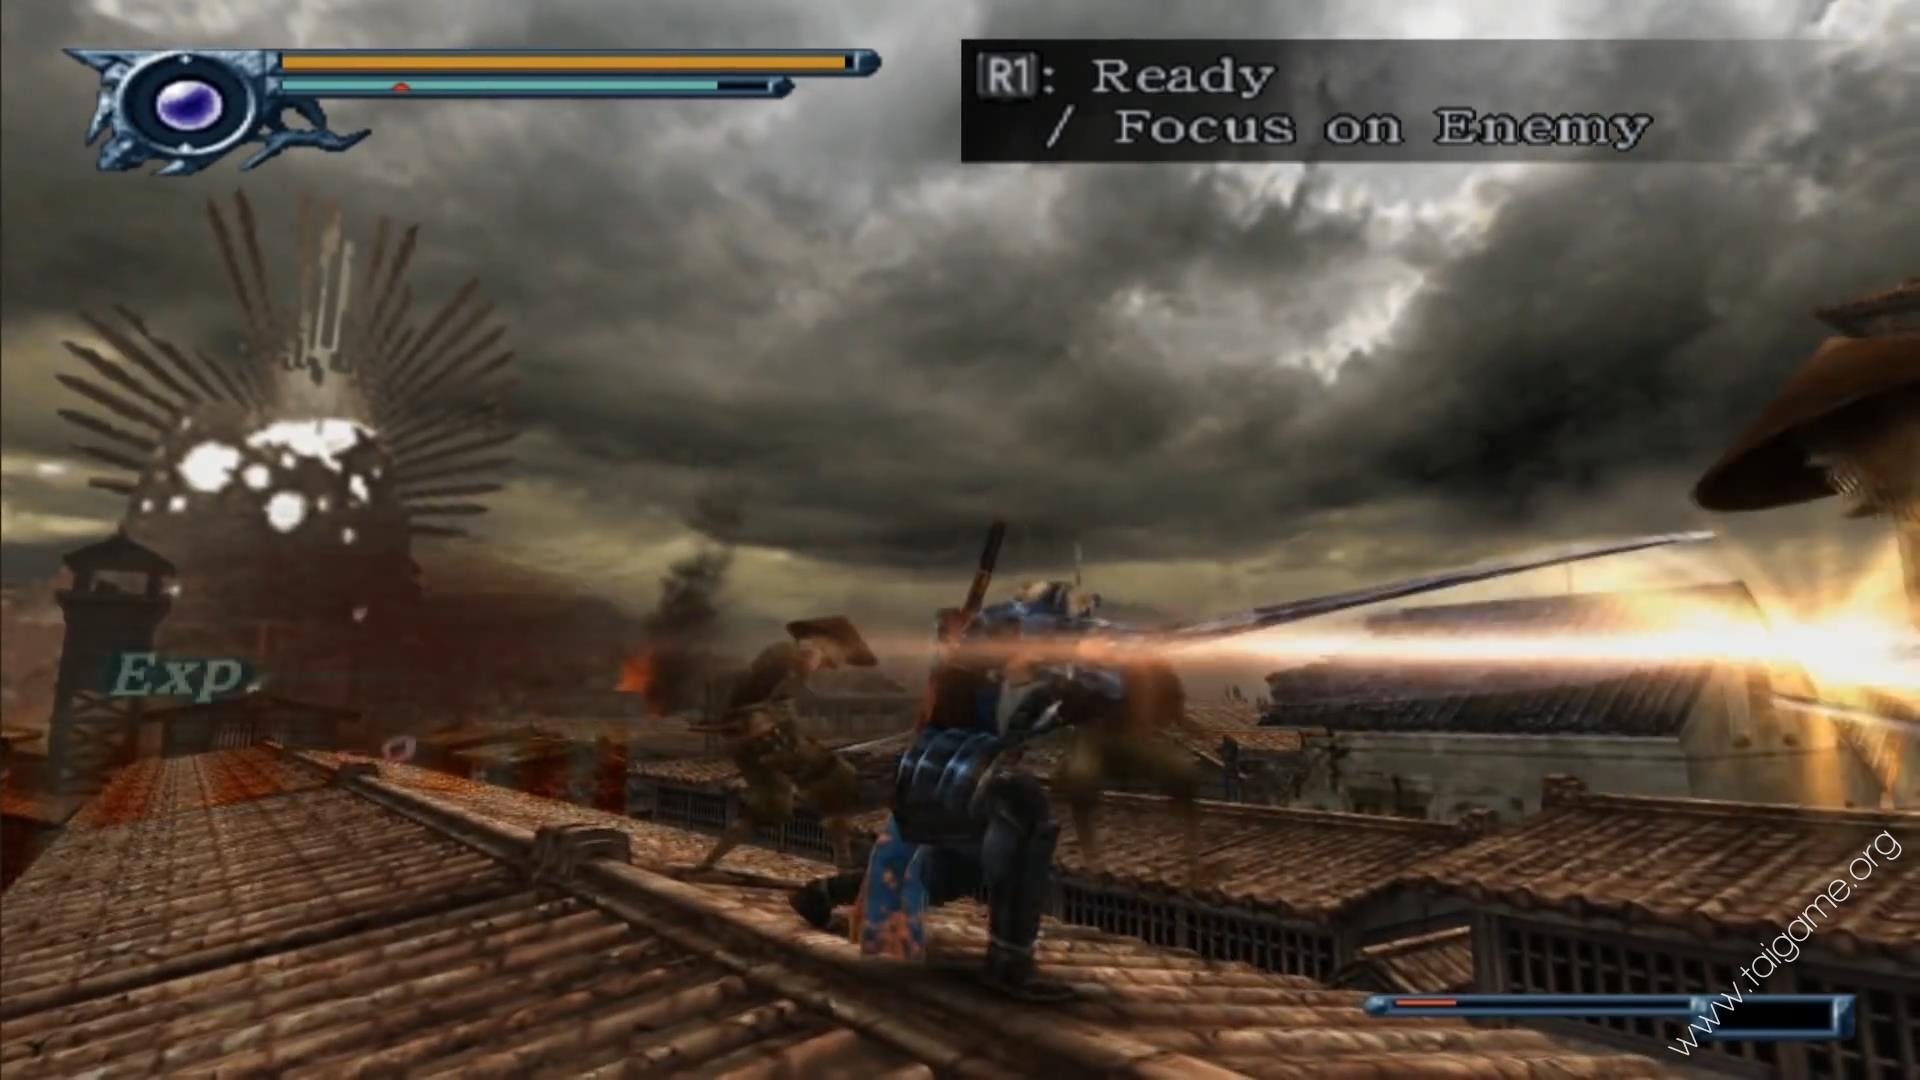 onimusha 4 pc game free download